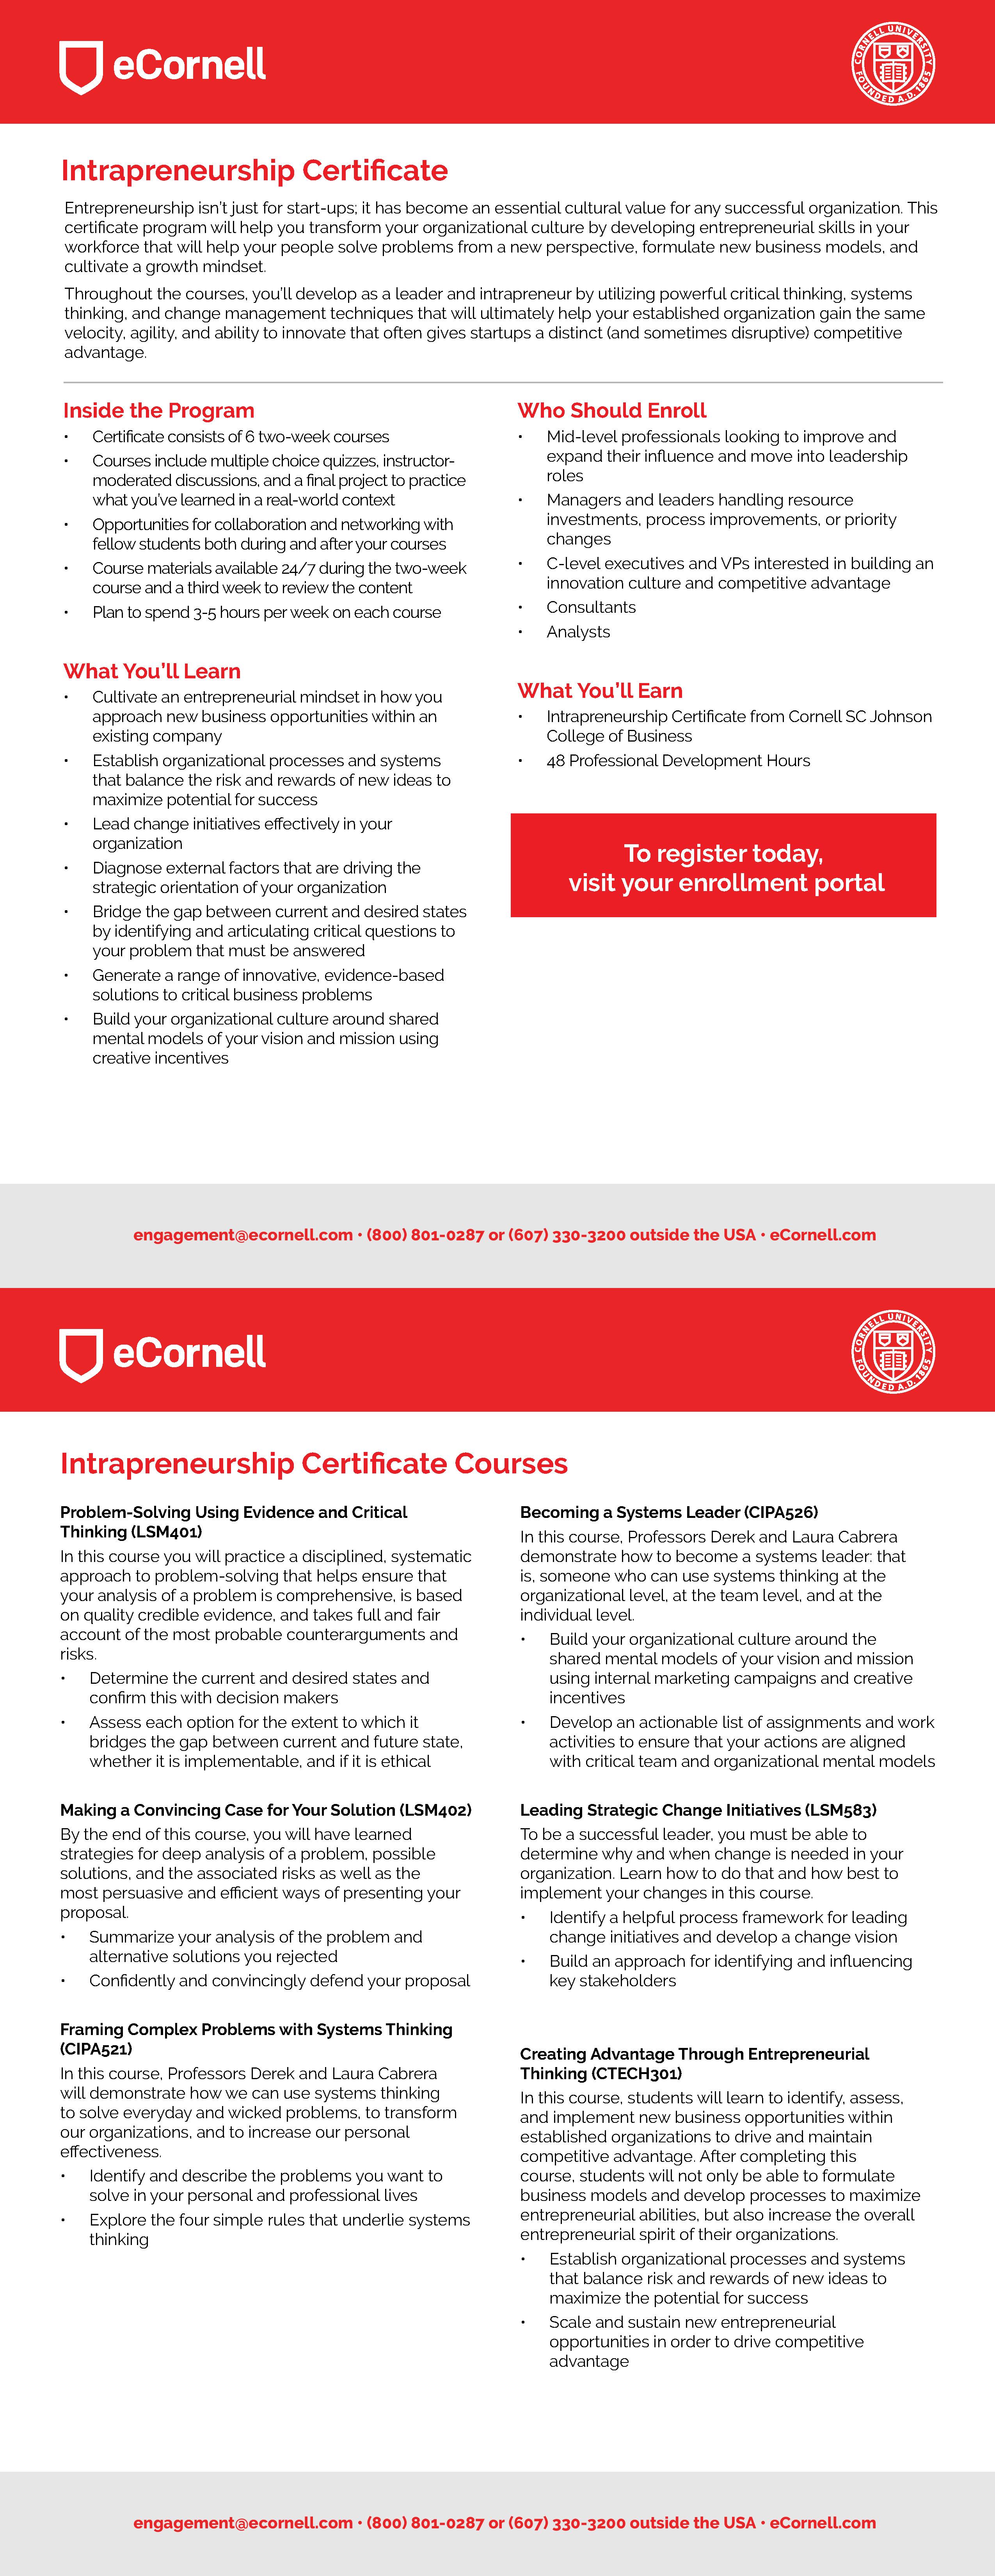 Intrapreneurship Flyer for Corporations